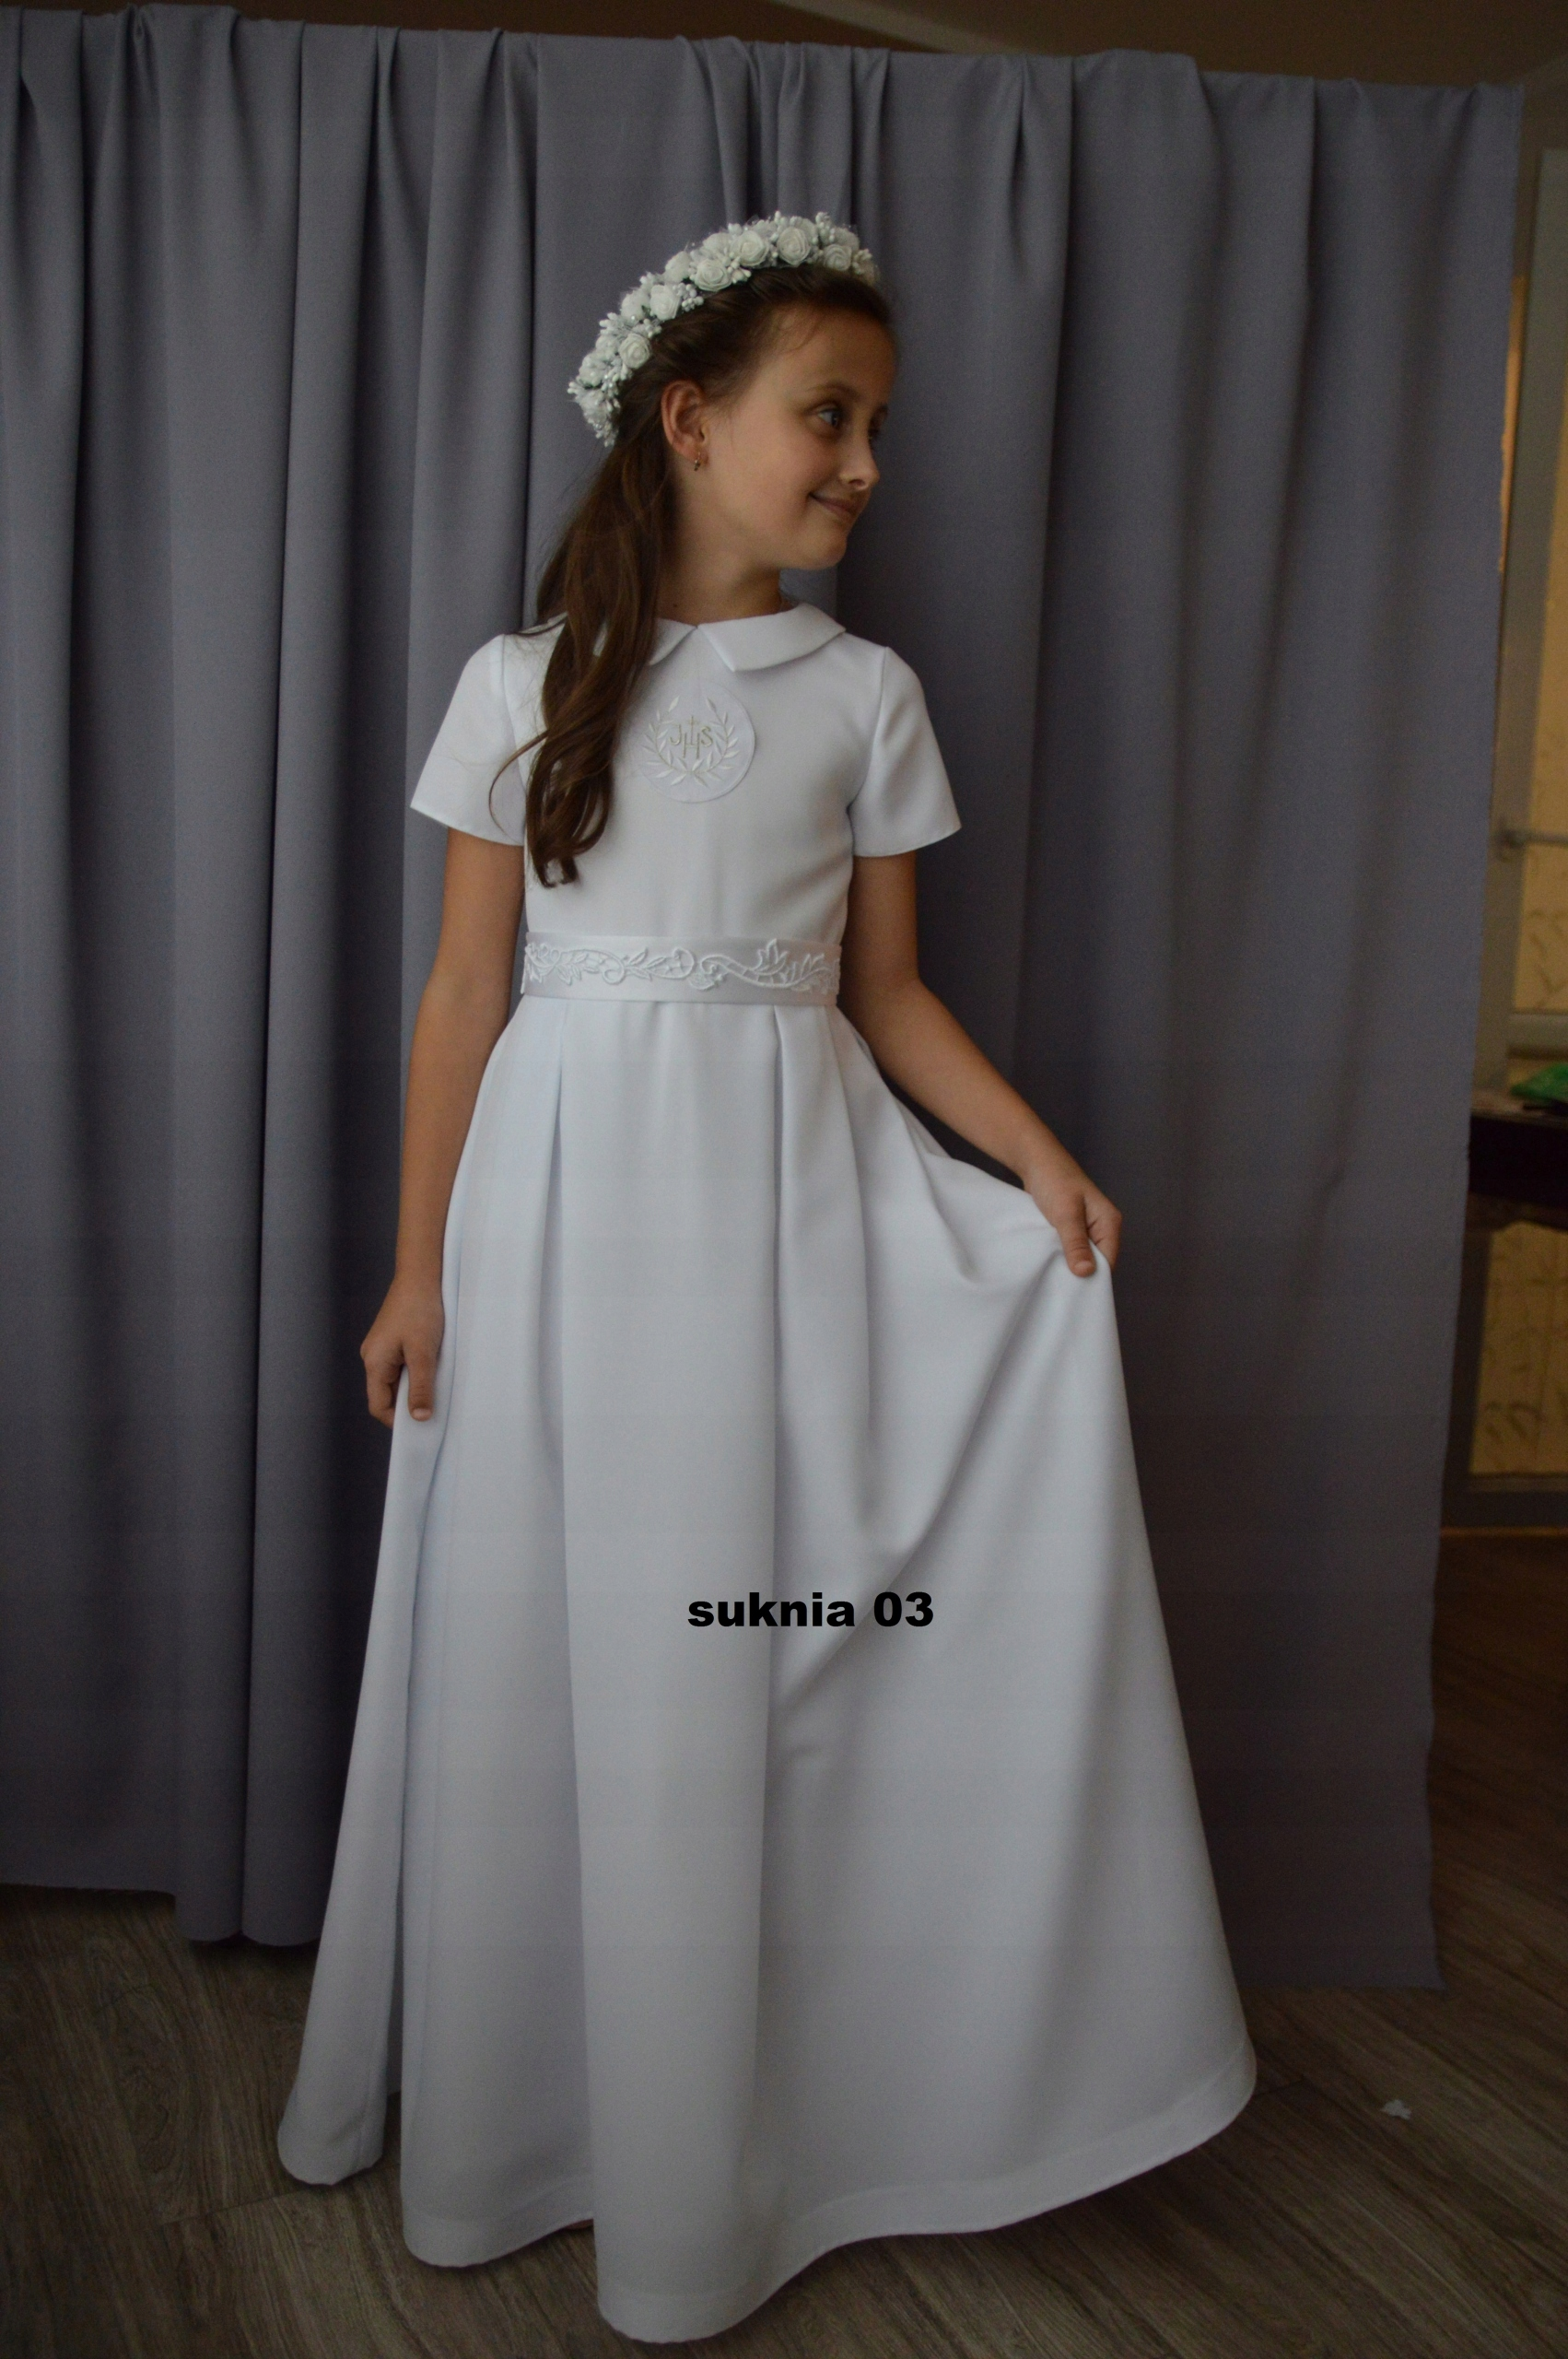 55a263aed0 alba sukienka komunijna sukienki komunijne - 7538330290 - oficjalne ...